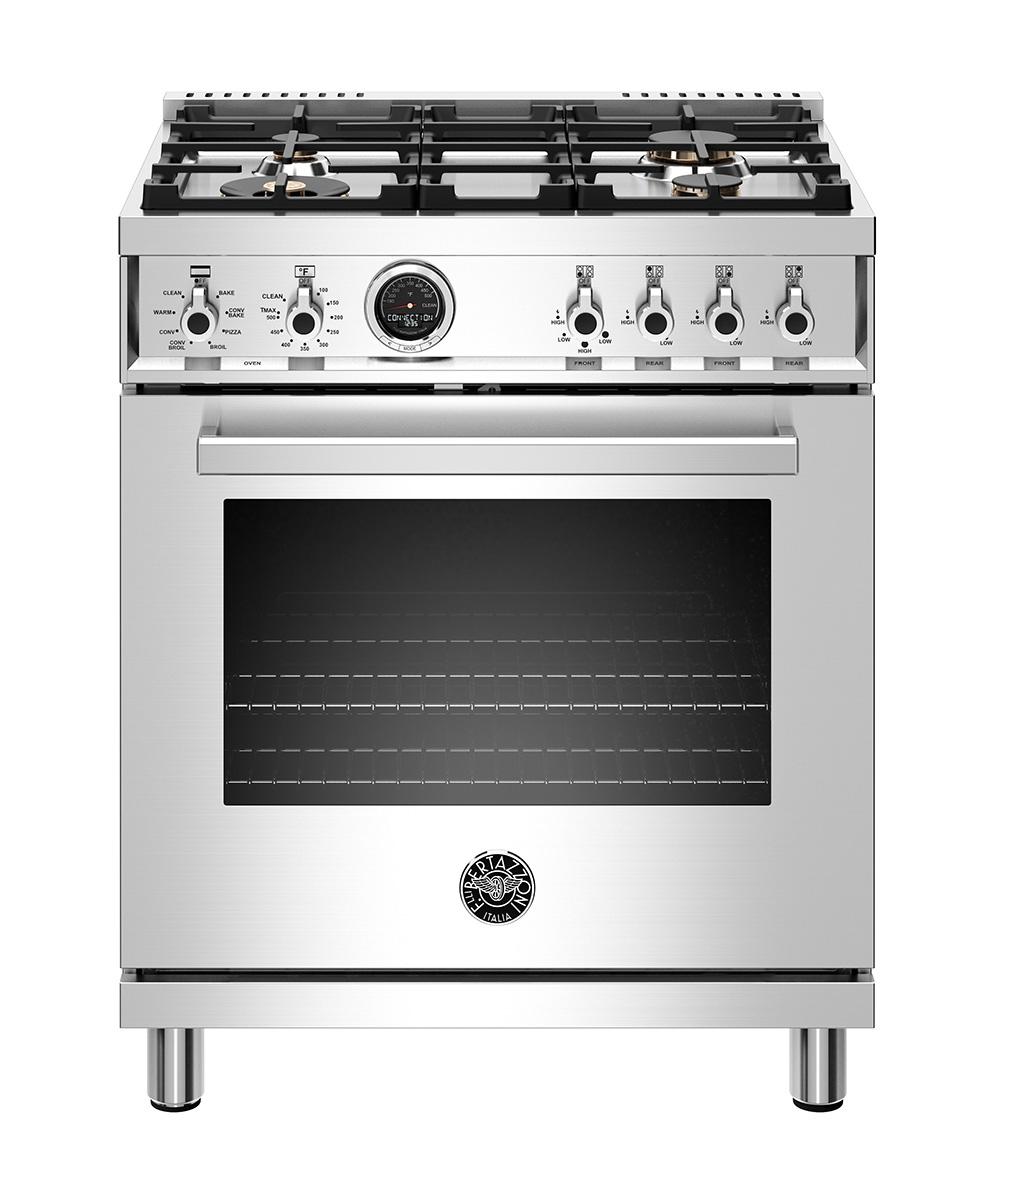 "Model: PROF304DFSXT | Bertazzoni 30"" Professional Series range - Electric self clean oven - 4 brass burners"